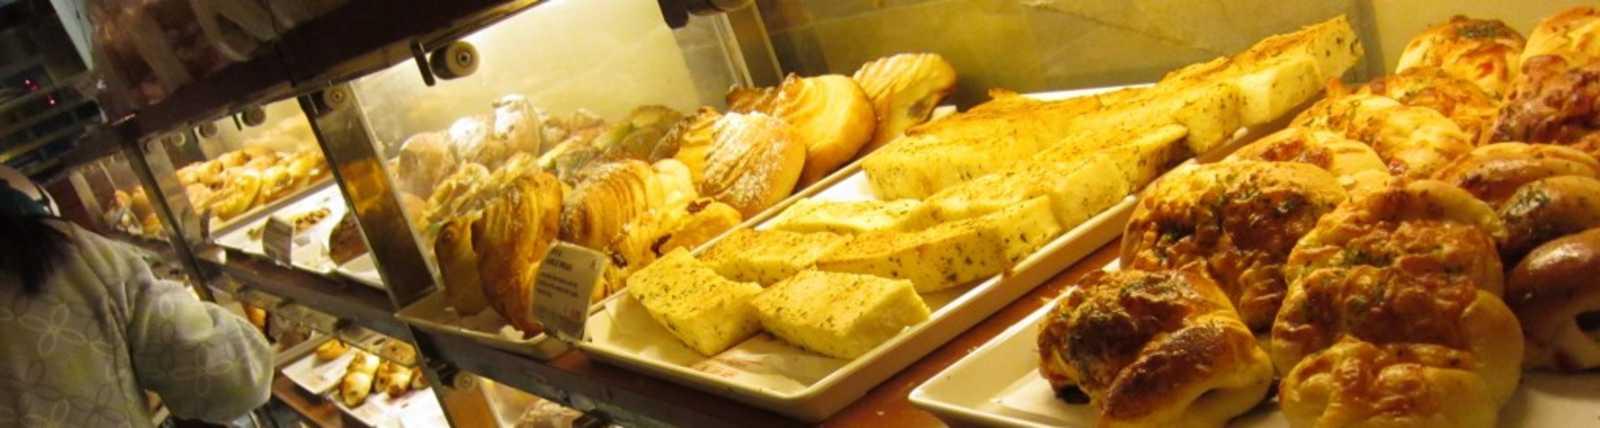 85C Bakery & Cafe